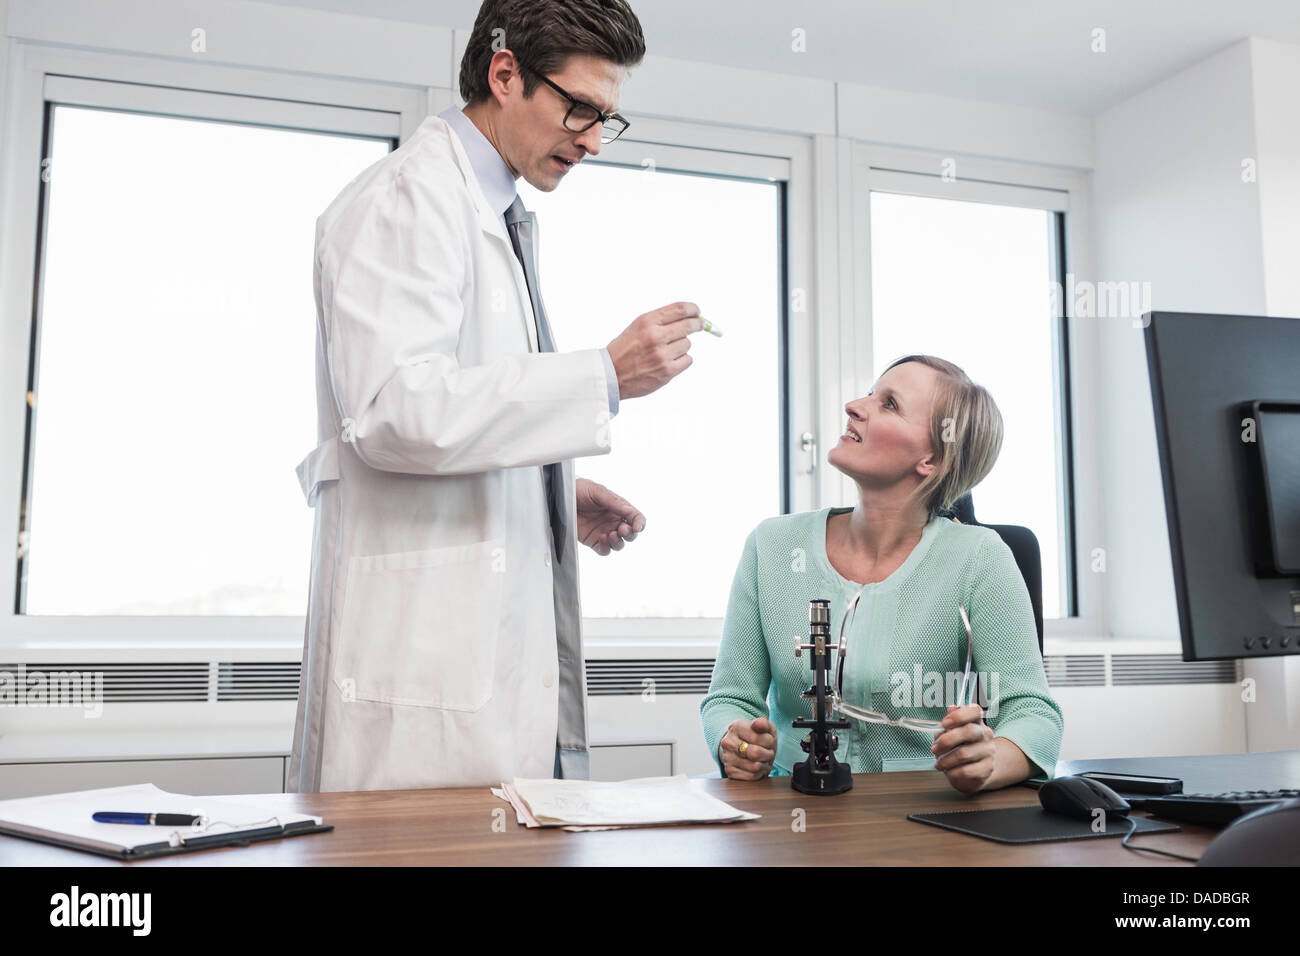 Man wearing lab coat holding test tube speaking to woman sat at desk - Stock Image